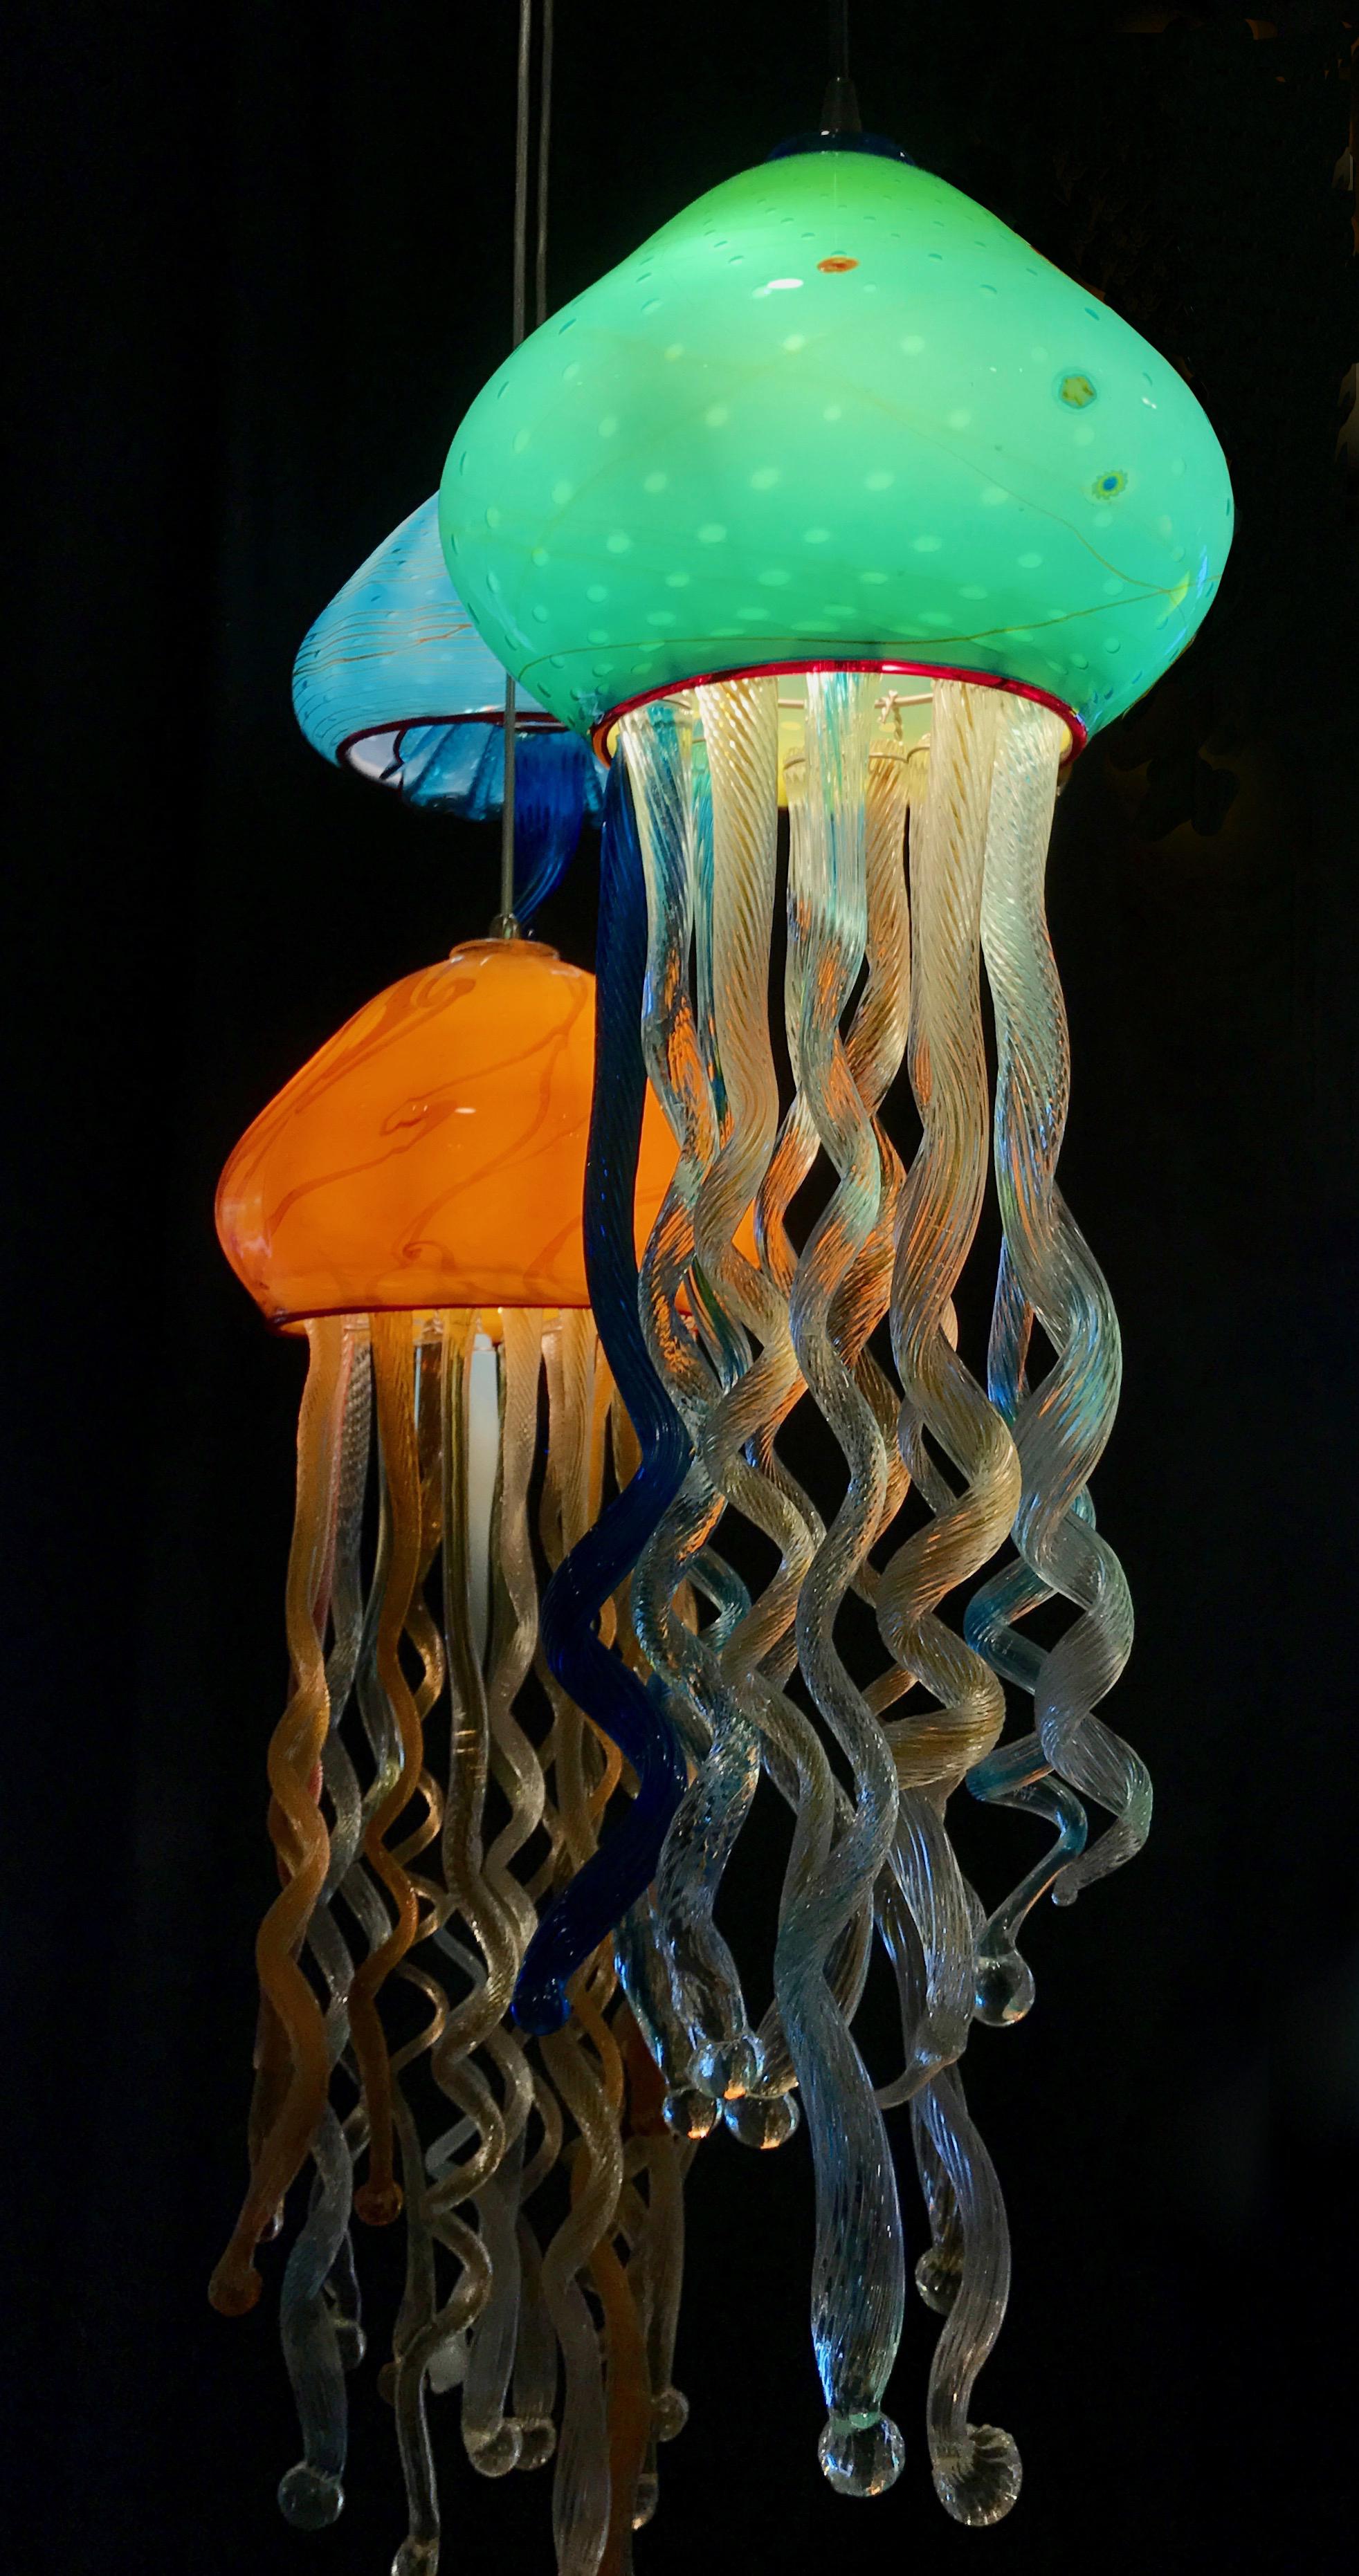 The smaller opening is way more pleasing. Aquarium JellyfishRick Strini2017